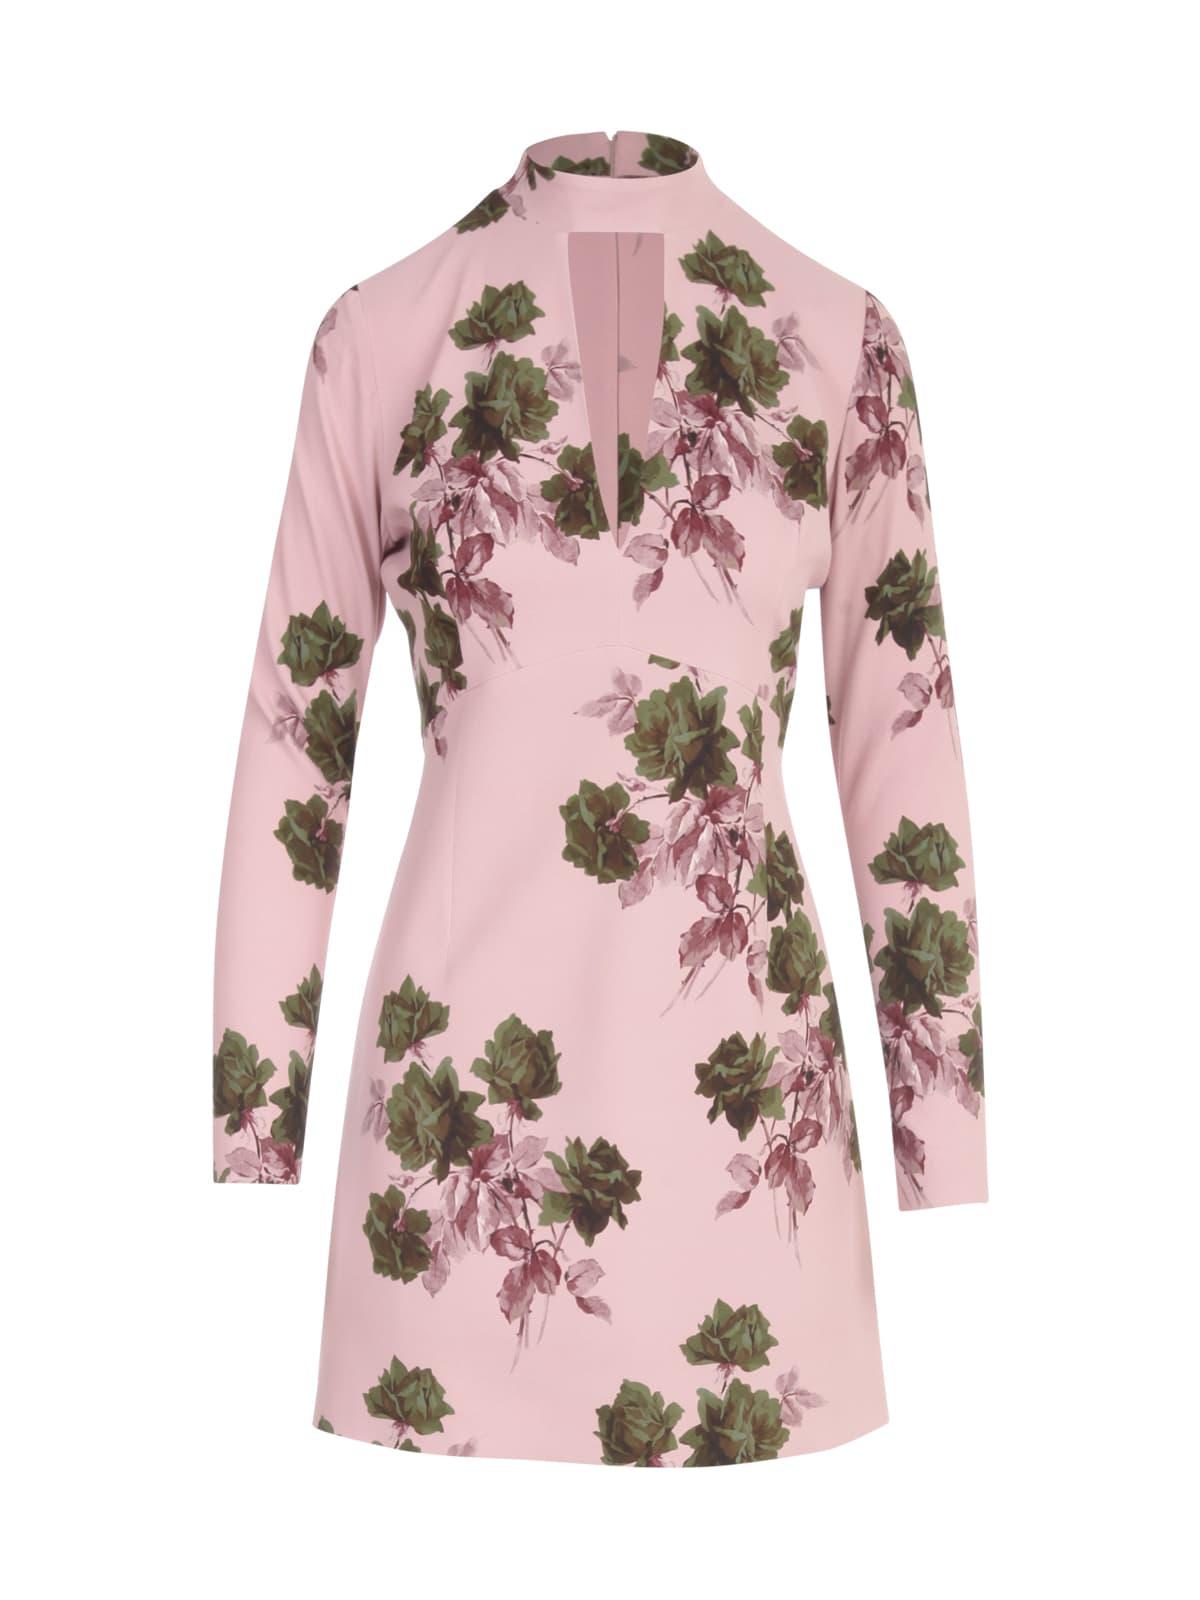 Buy Blumarine Roses Printing L/s Mini Dress online, shop Blumarine with free shipping